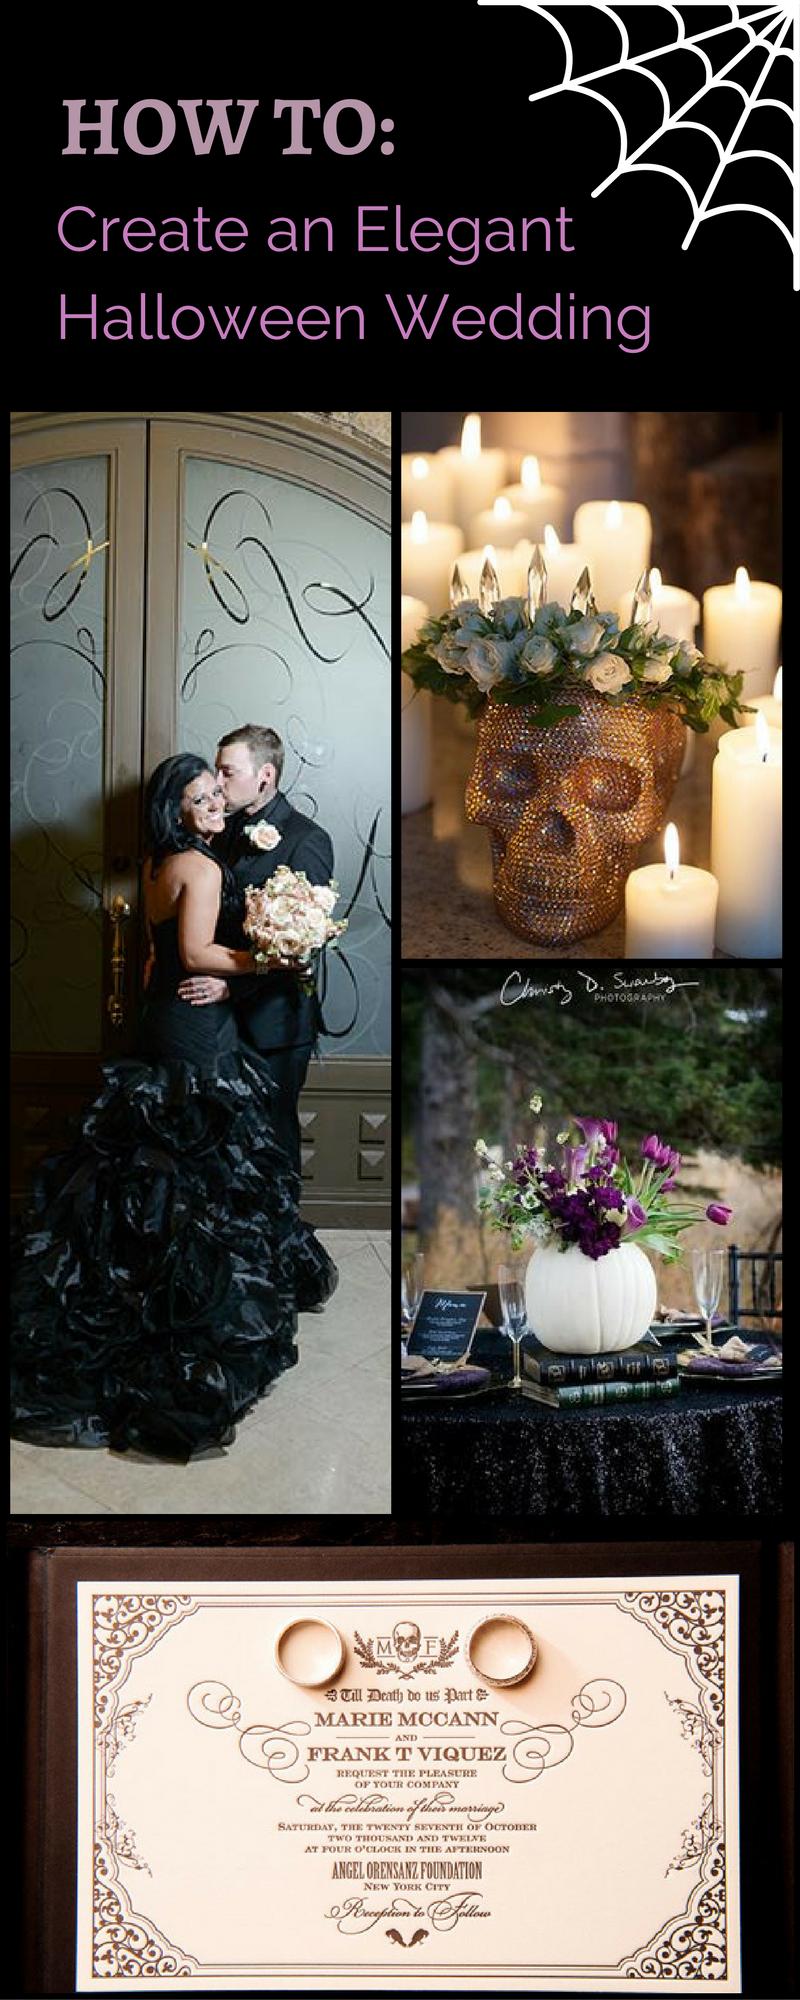 Classy Halloween Wedding Ideas Classy Halloween Wedding Halloween Themed Wedding Weddings Decorations Elegant Romantic